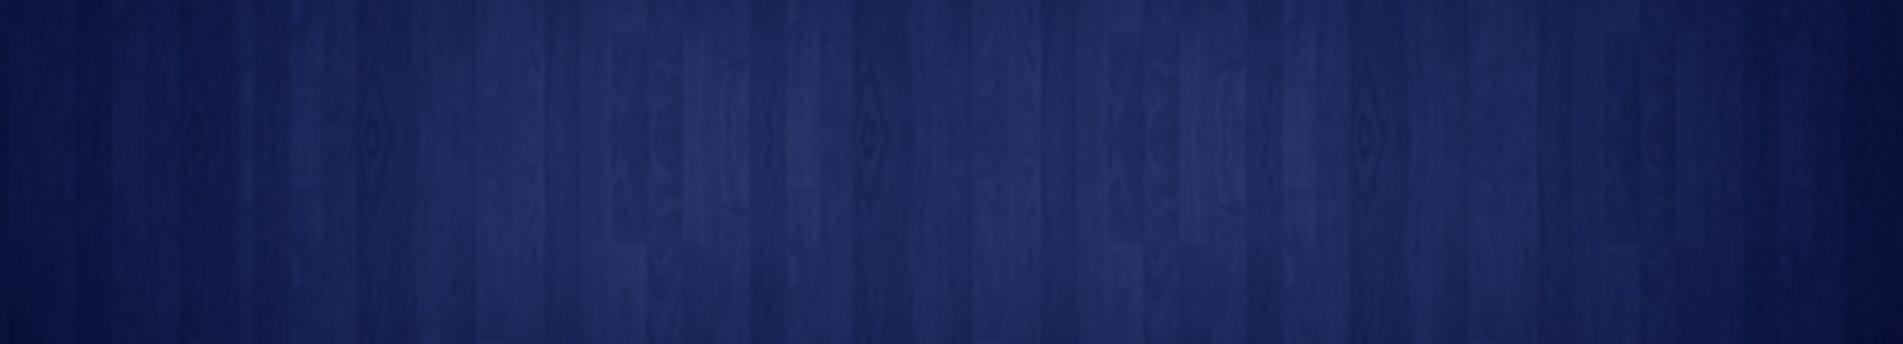 blue-background_a.jpg